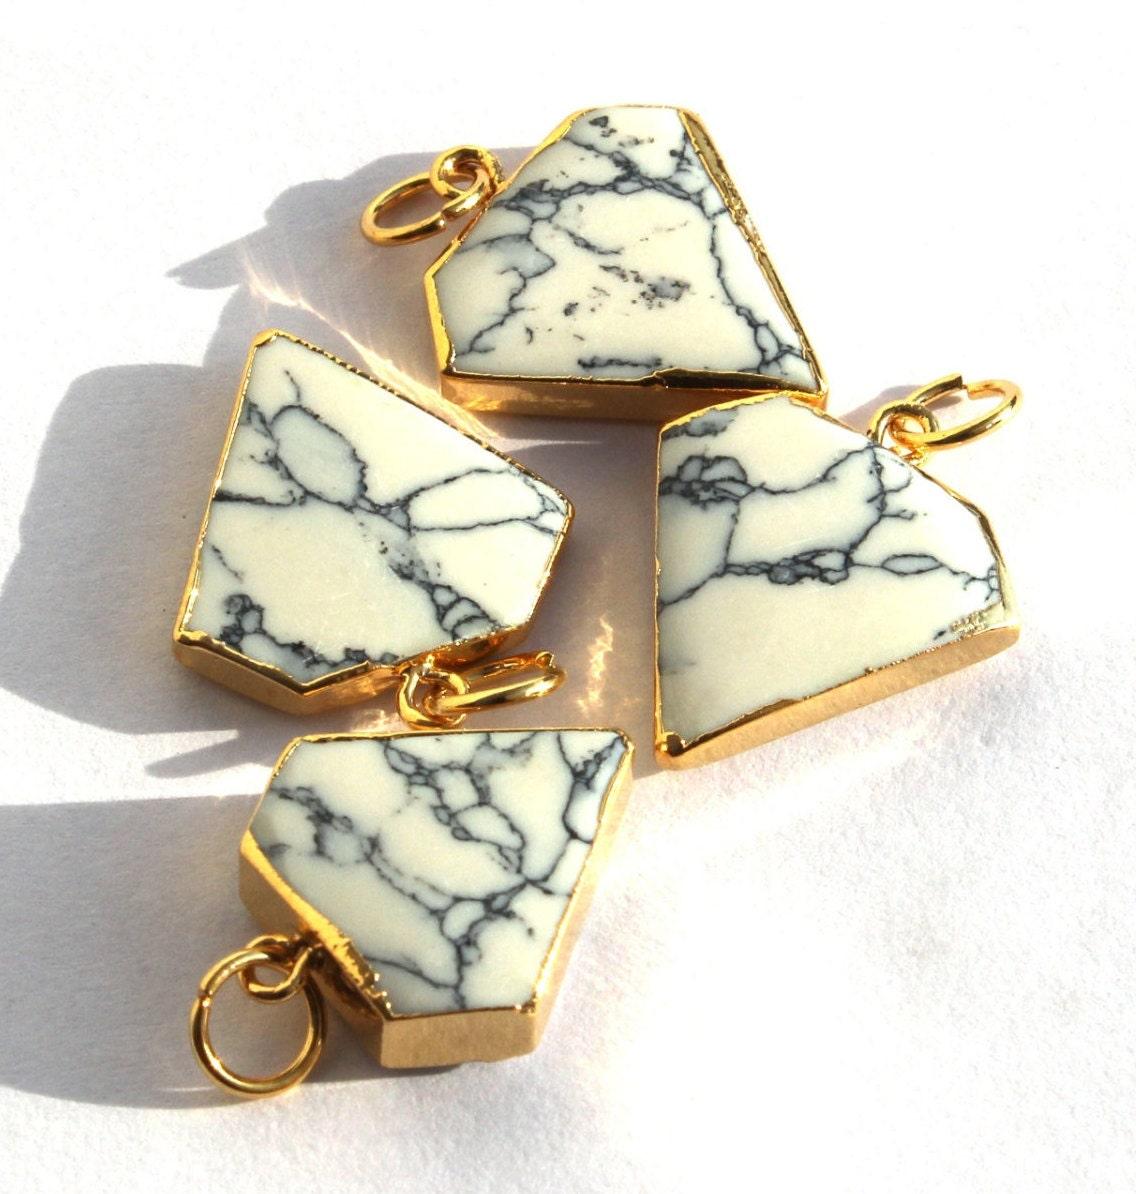 Single Bail Pendant 1 Pc 31x11mm Gold Electroplated Edge Howlite Sediment Gemstone Pendant DIY Jewelry Making Bar Station Pendant MX14